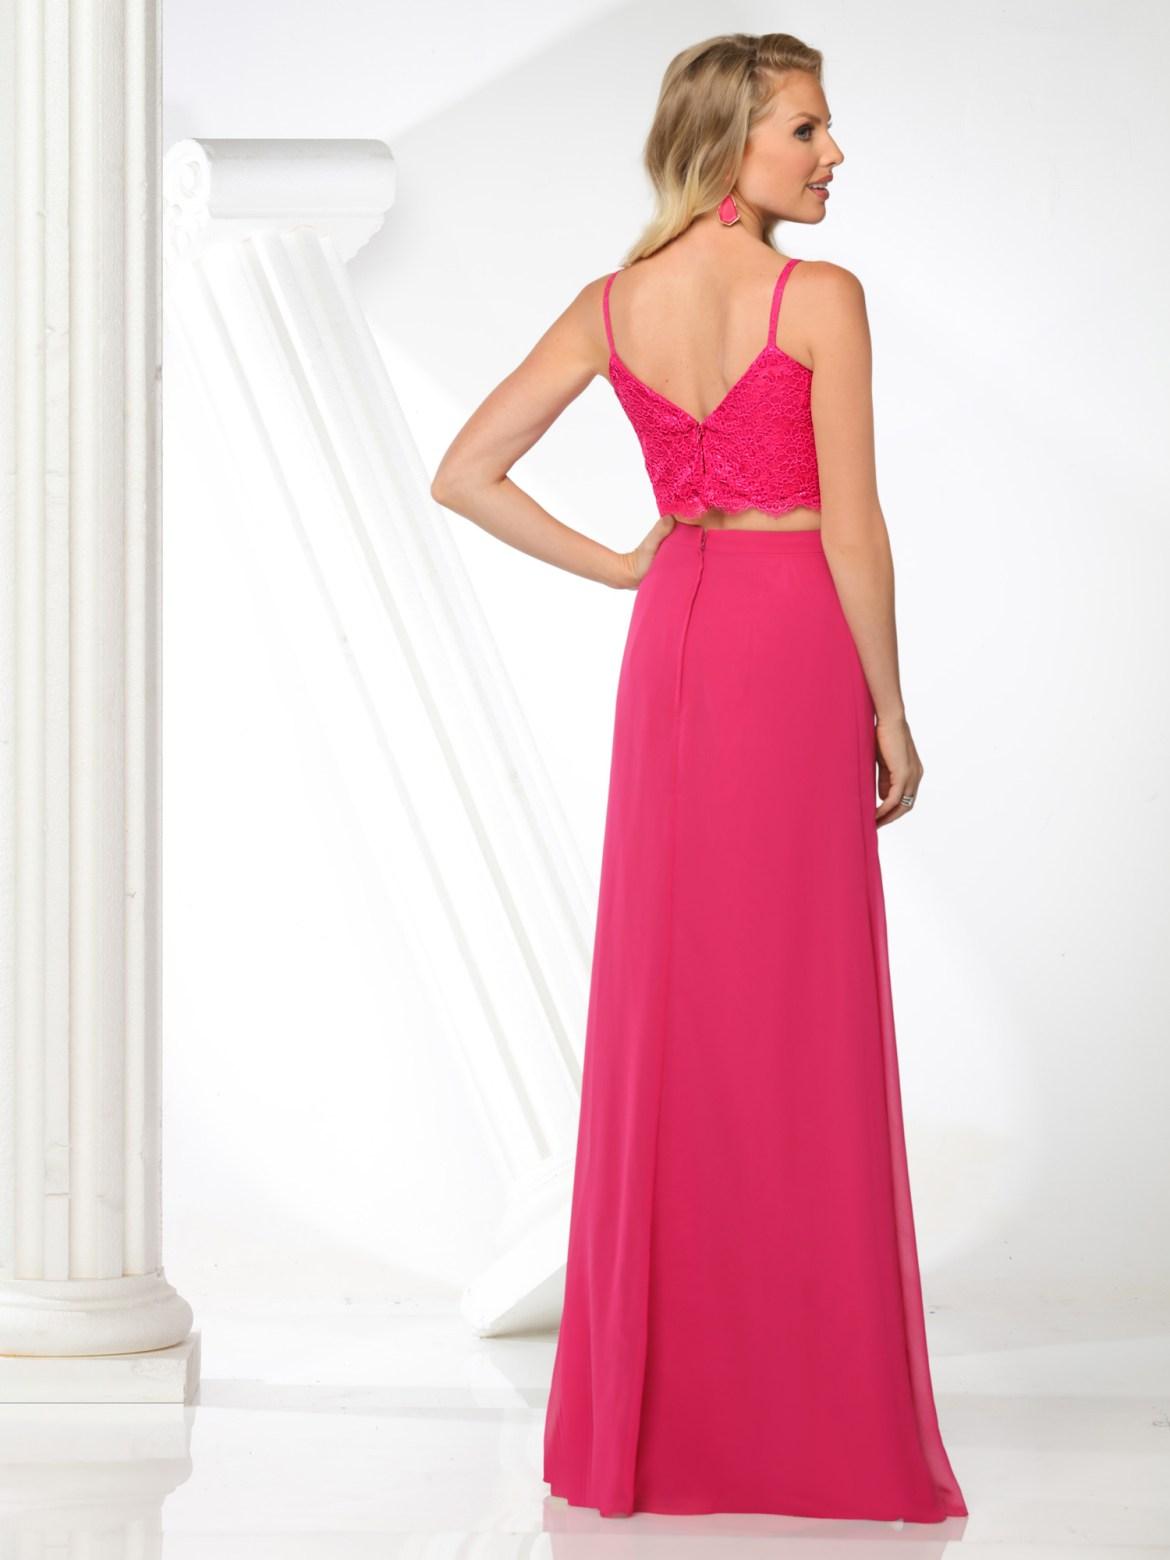 bbab47b5c85 Flirty Floor Length Bridesmaid Dresses